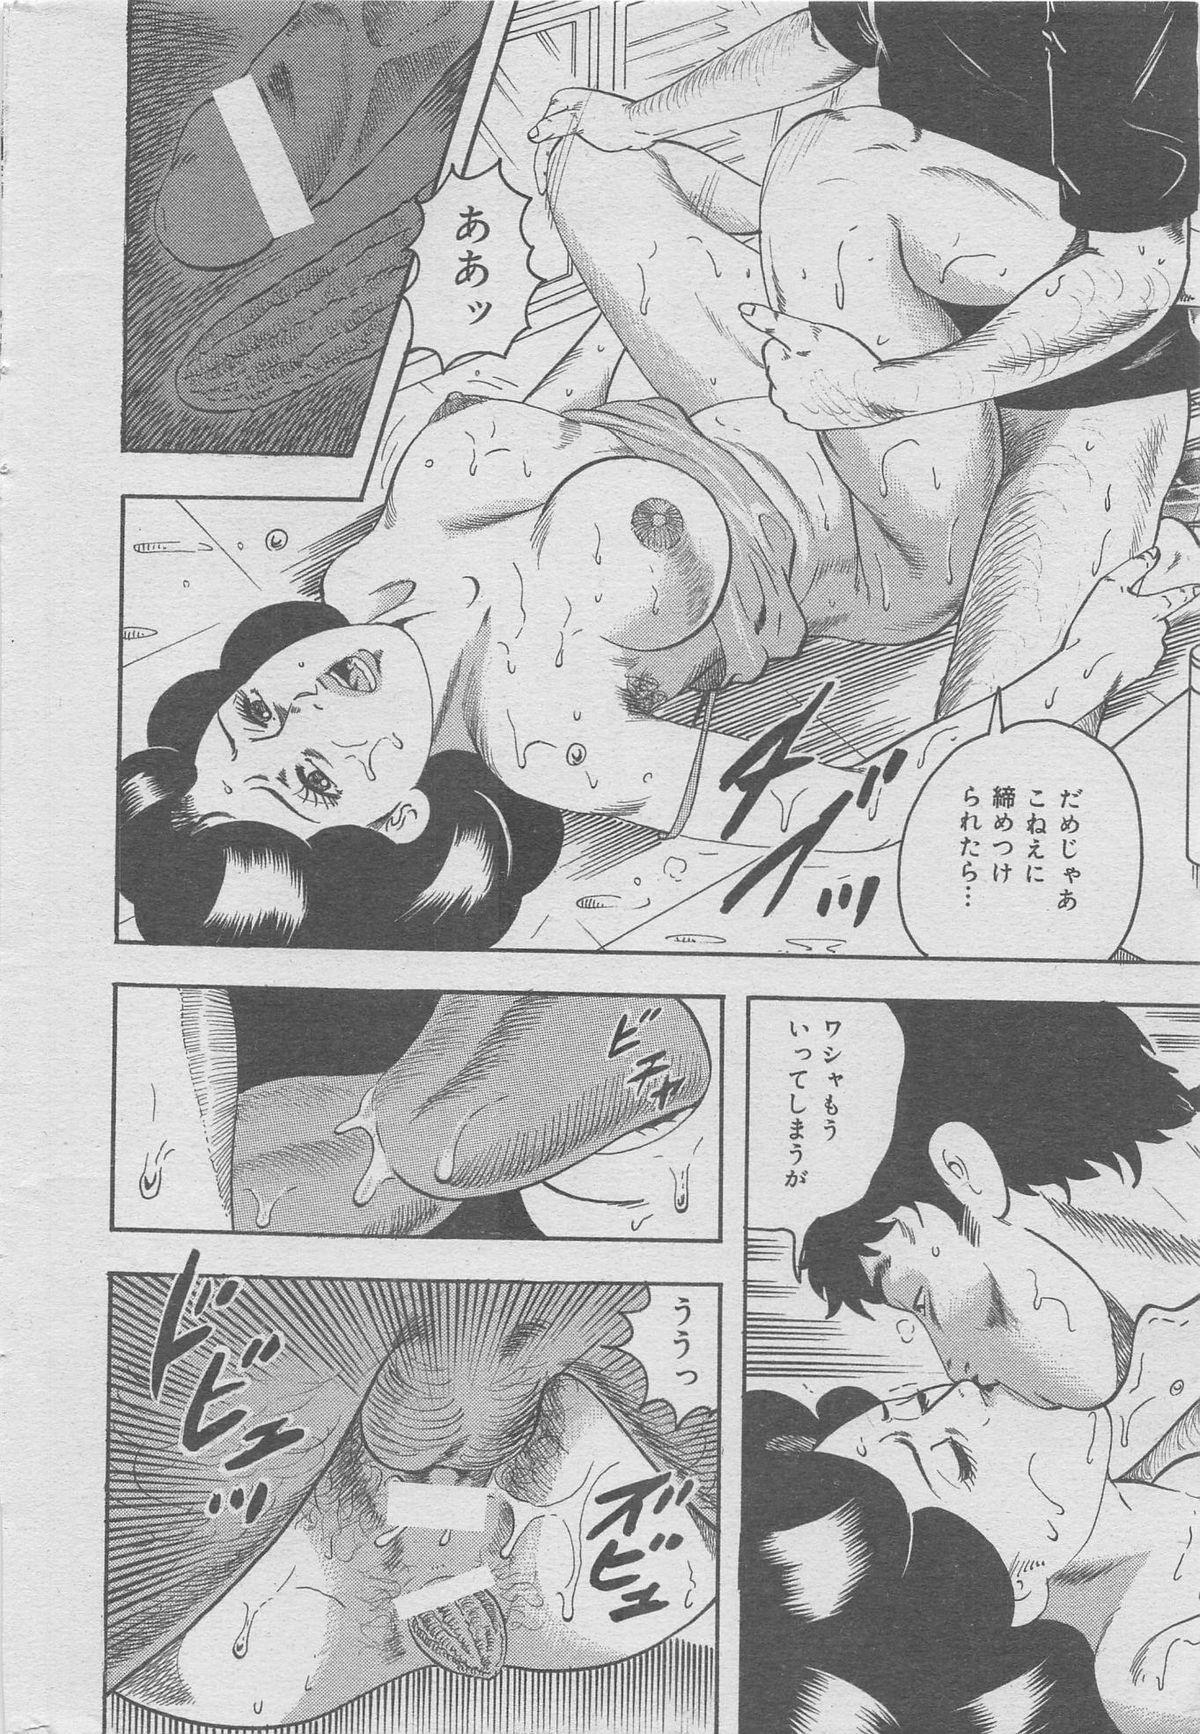 Hontou ni Atta Kindanai vol.7 15